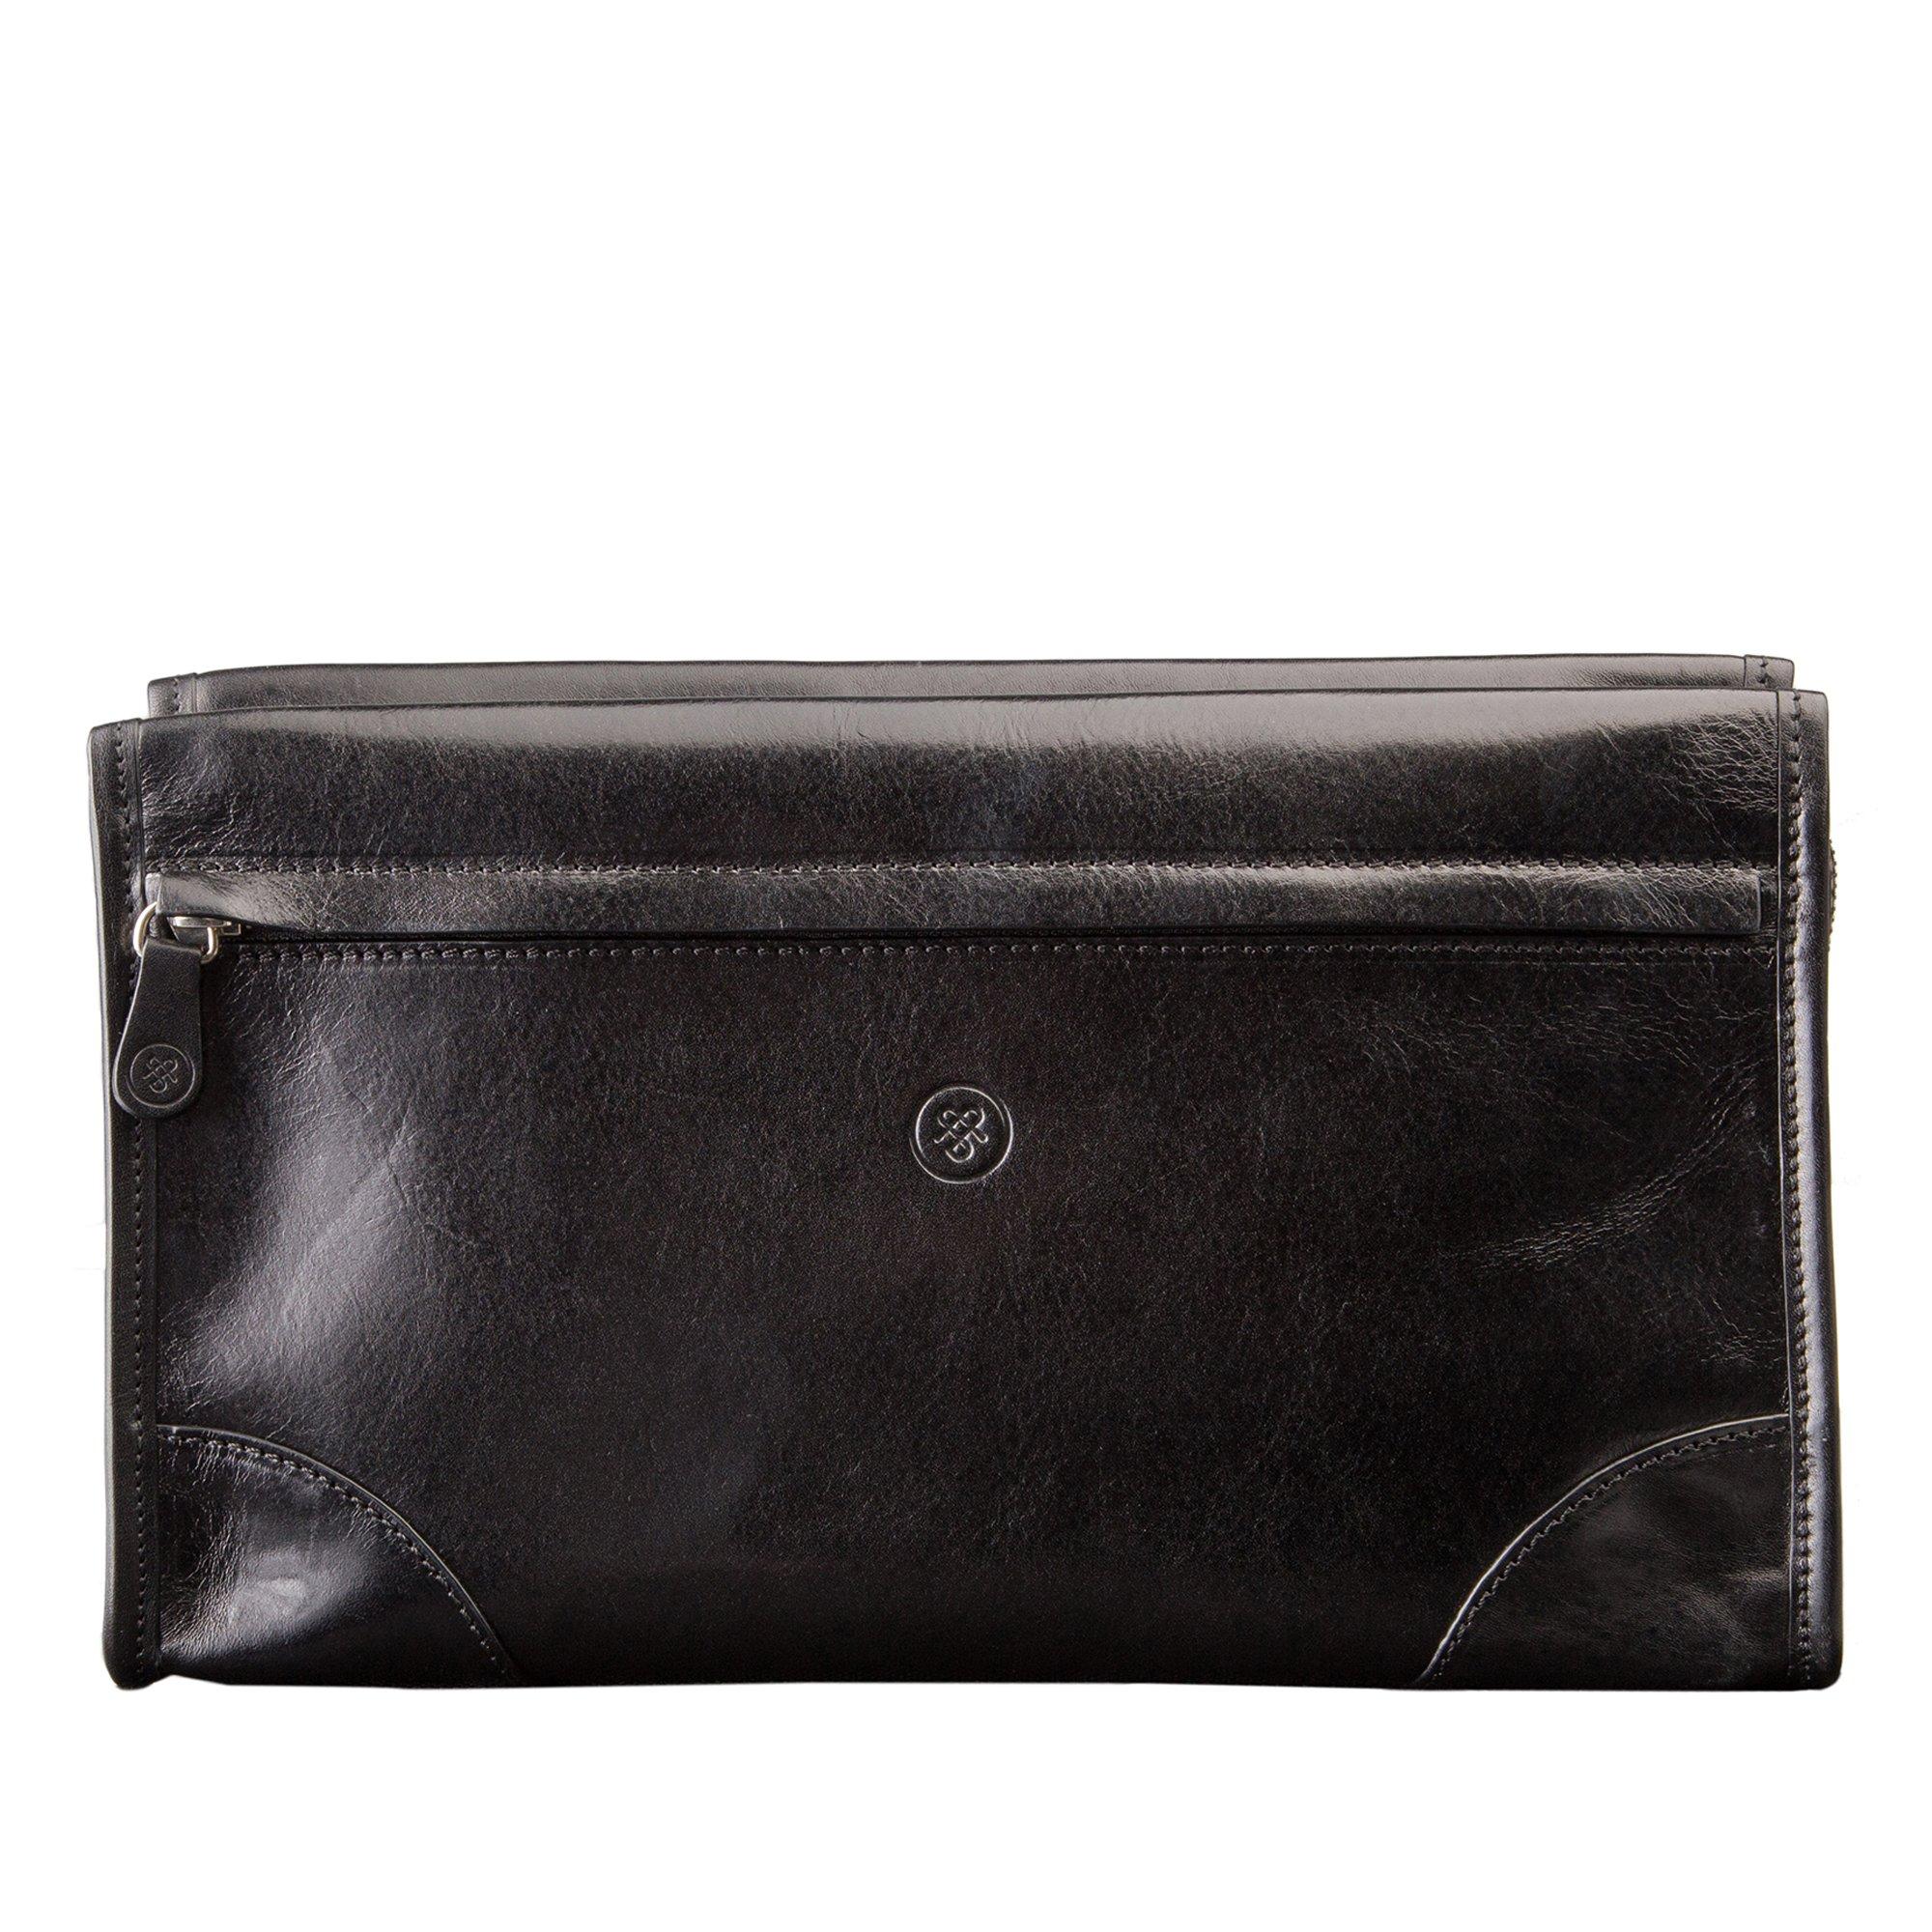 Maxwell Scott Personalized Maxwell Scott Personalized Luxury Black Leather Dopp Kit (The Tanta) - One Size